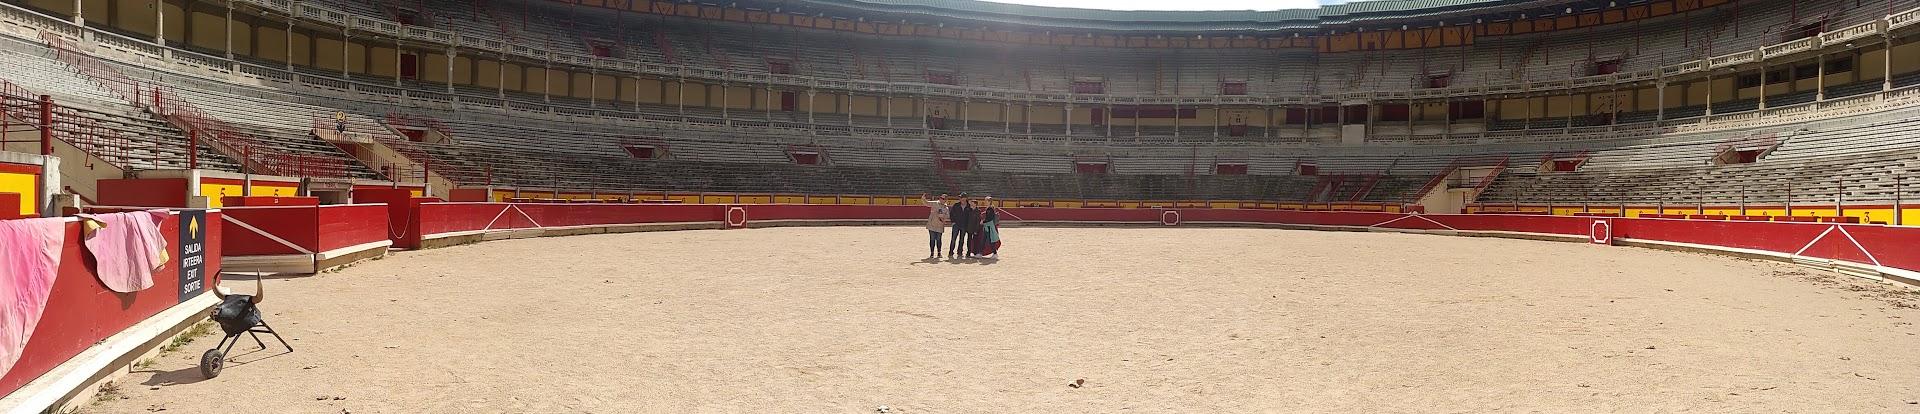 plaza Pamplona siendo visitada